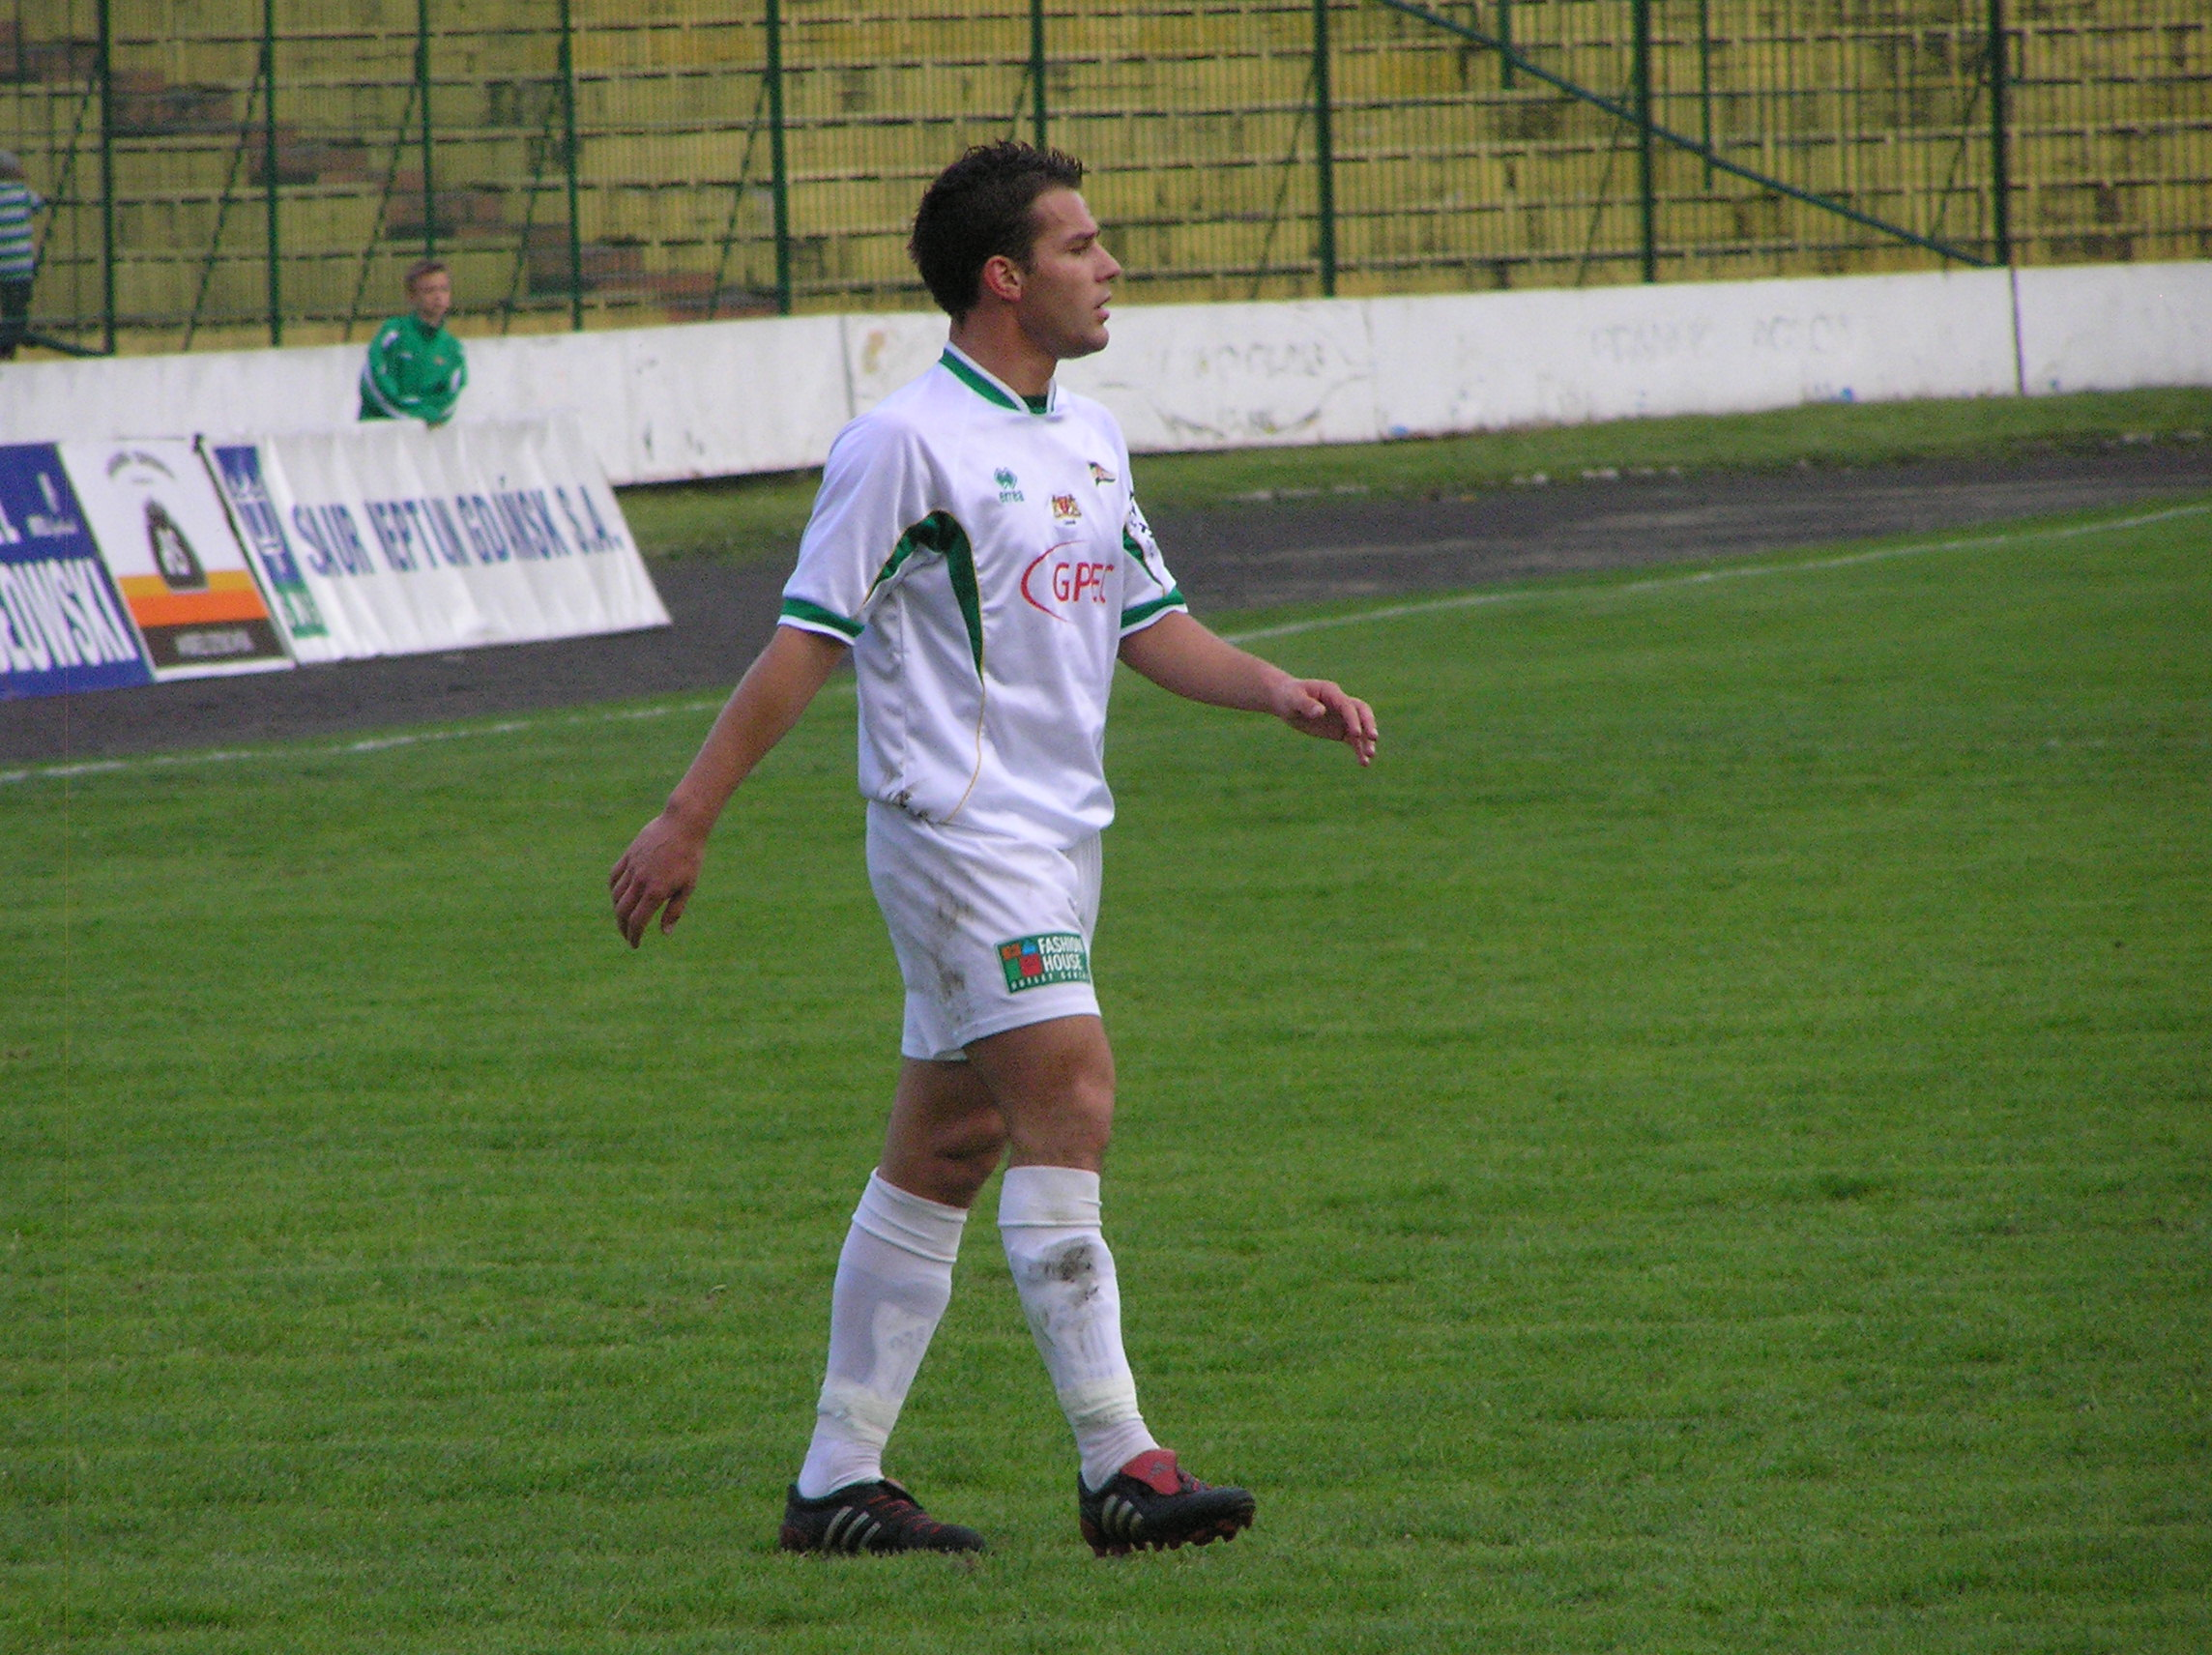 Jakub Bisku